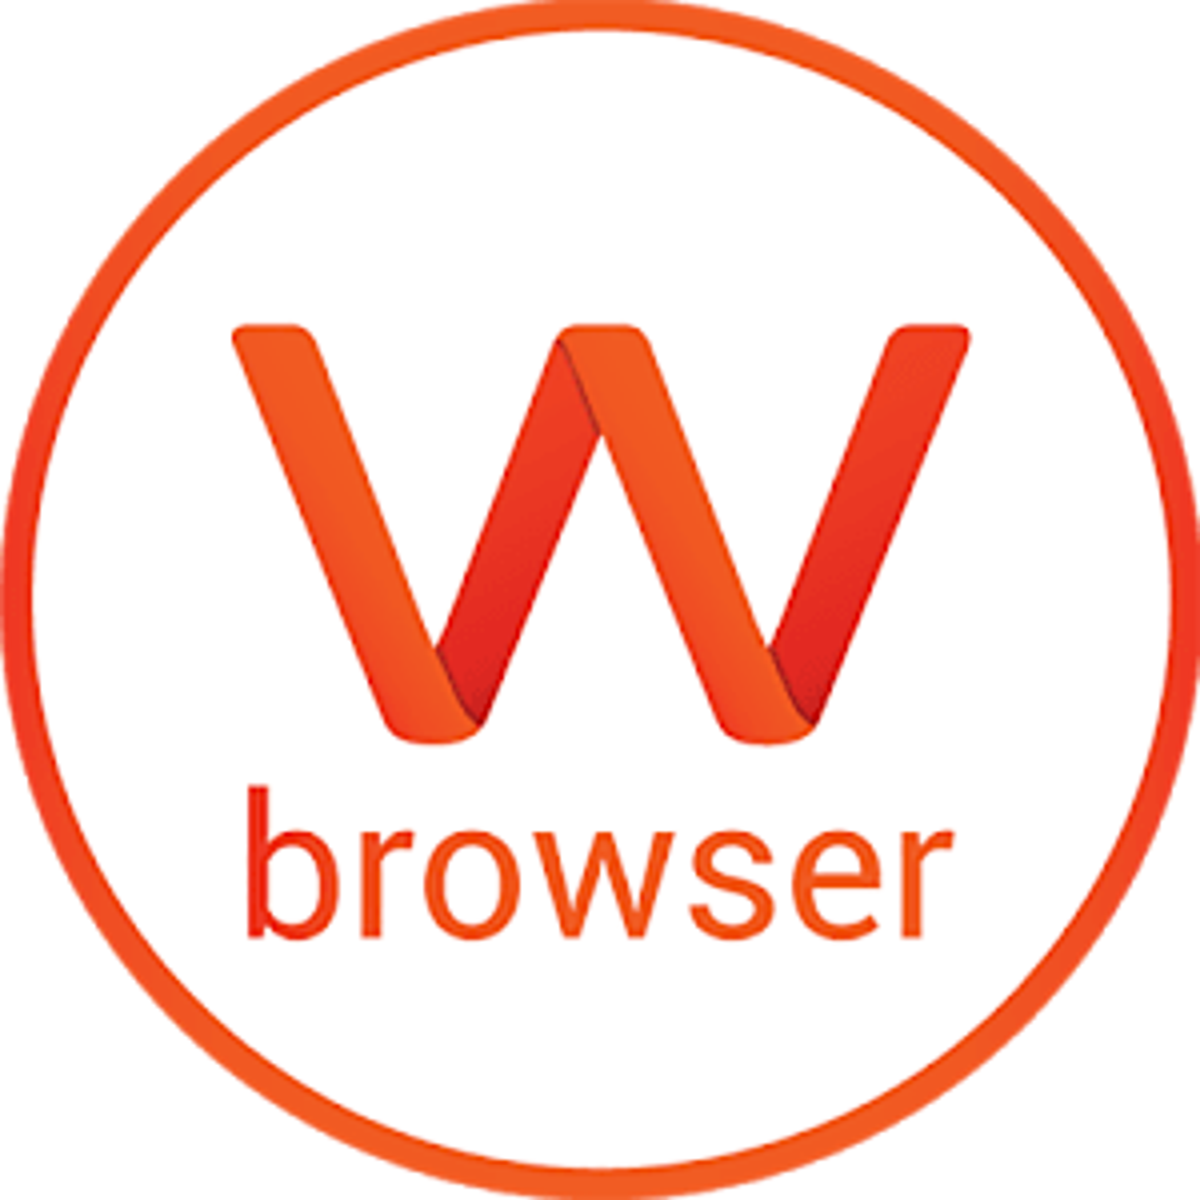 WADA Browser: navegador ligero